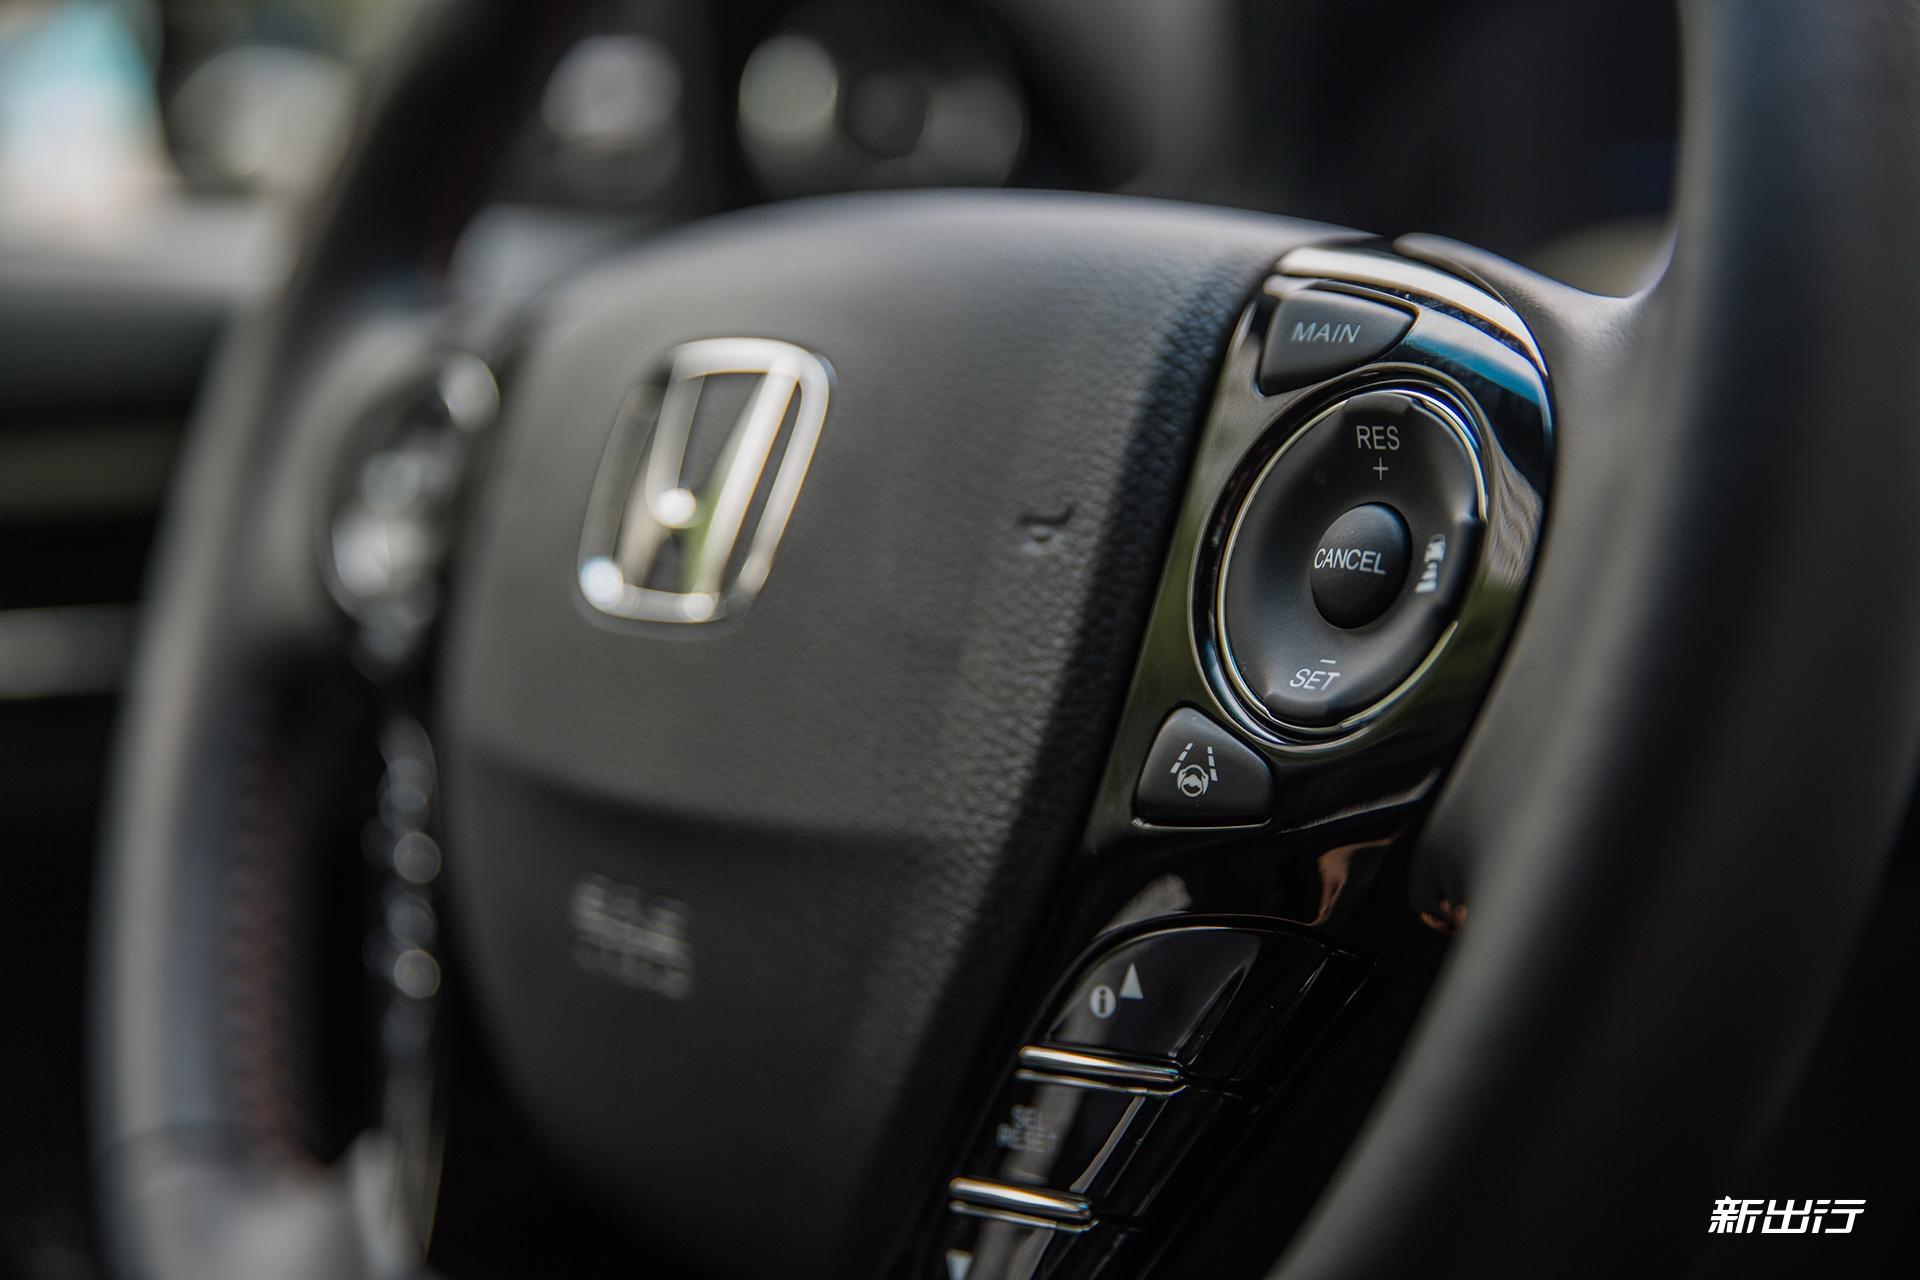 acc 自适应巡航,车道保持系统功能按键